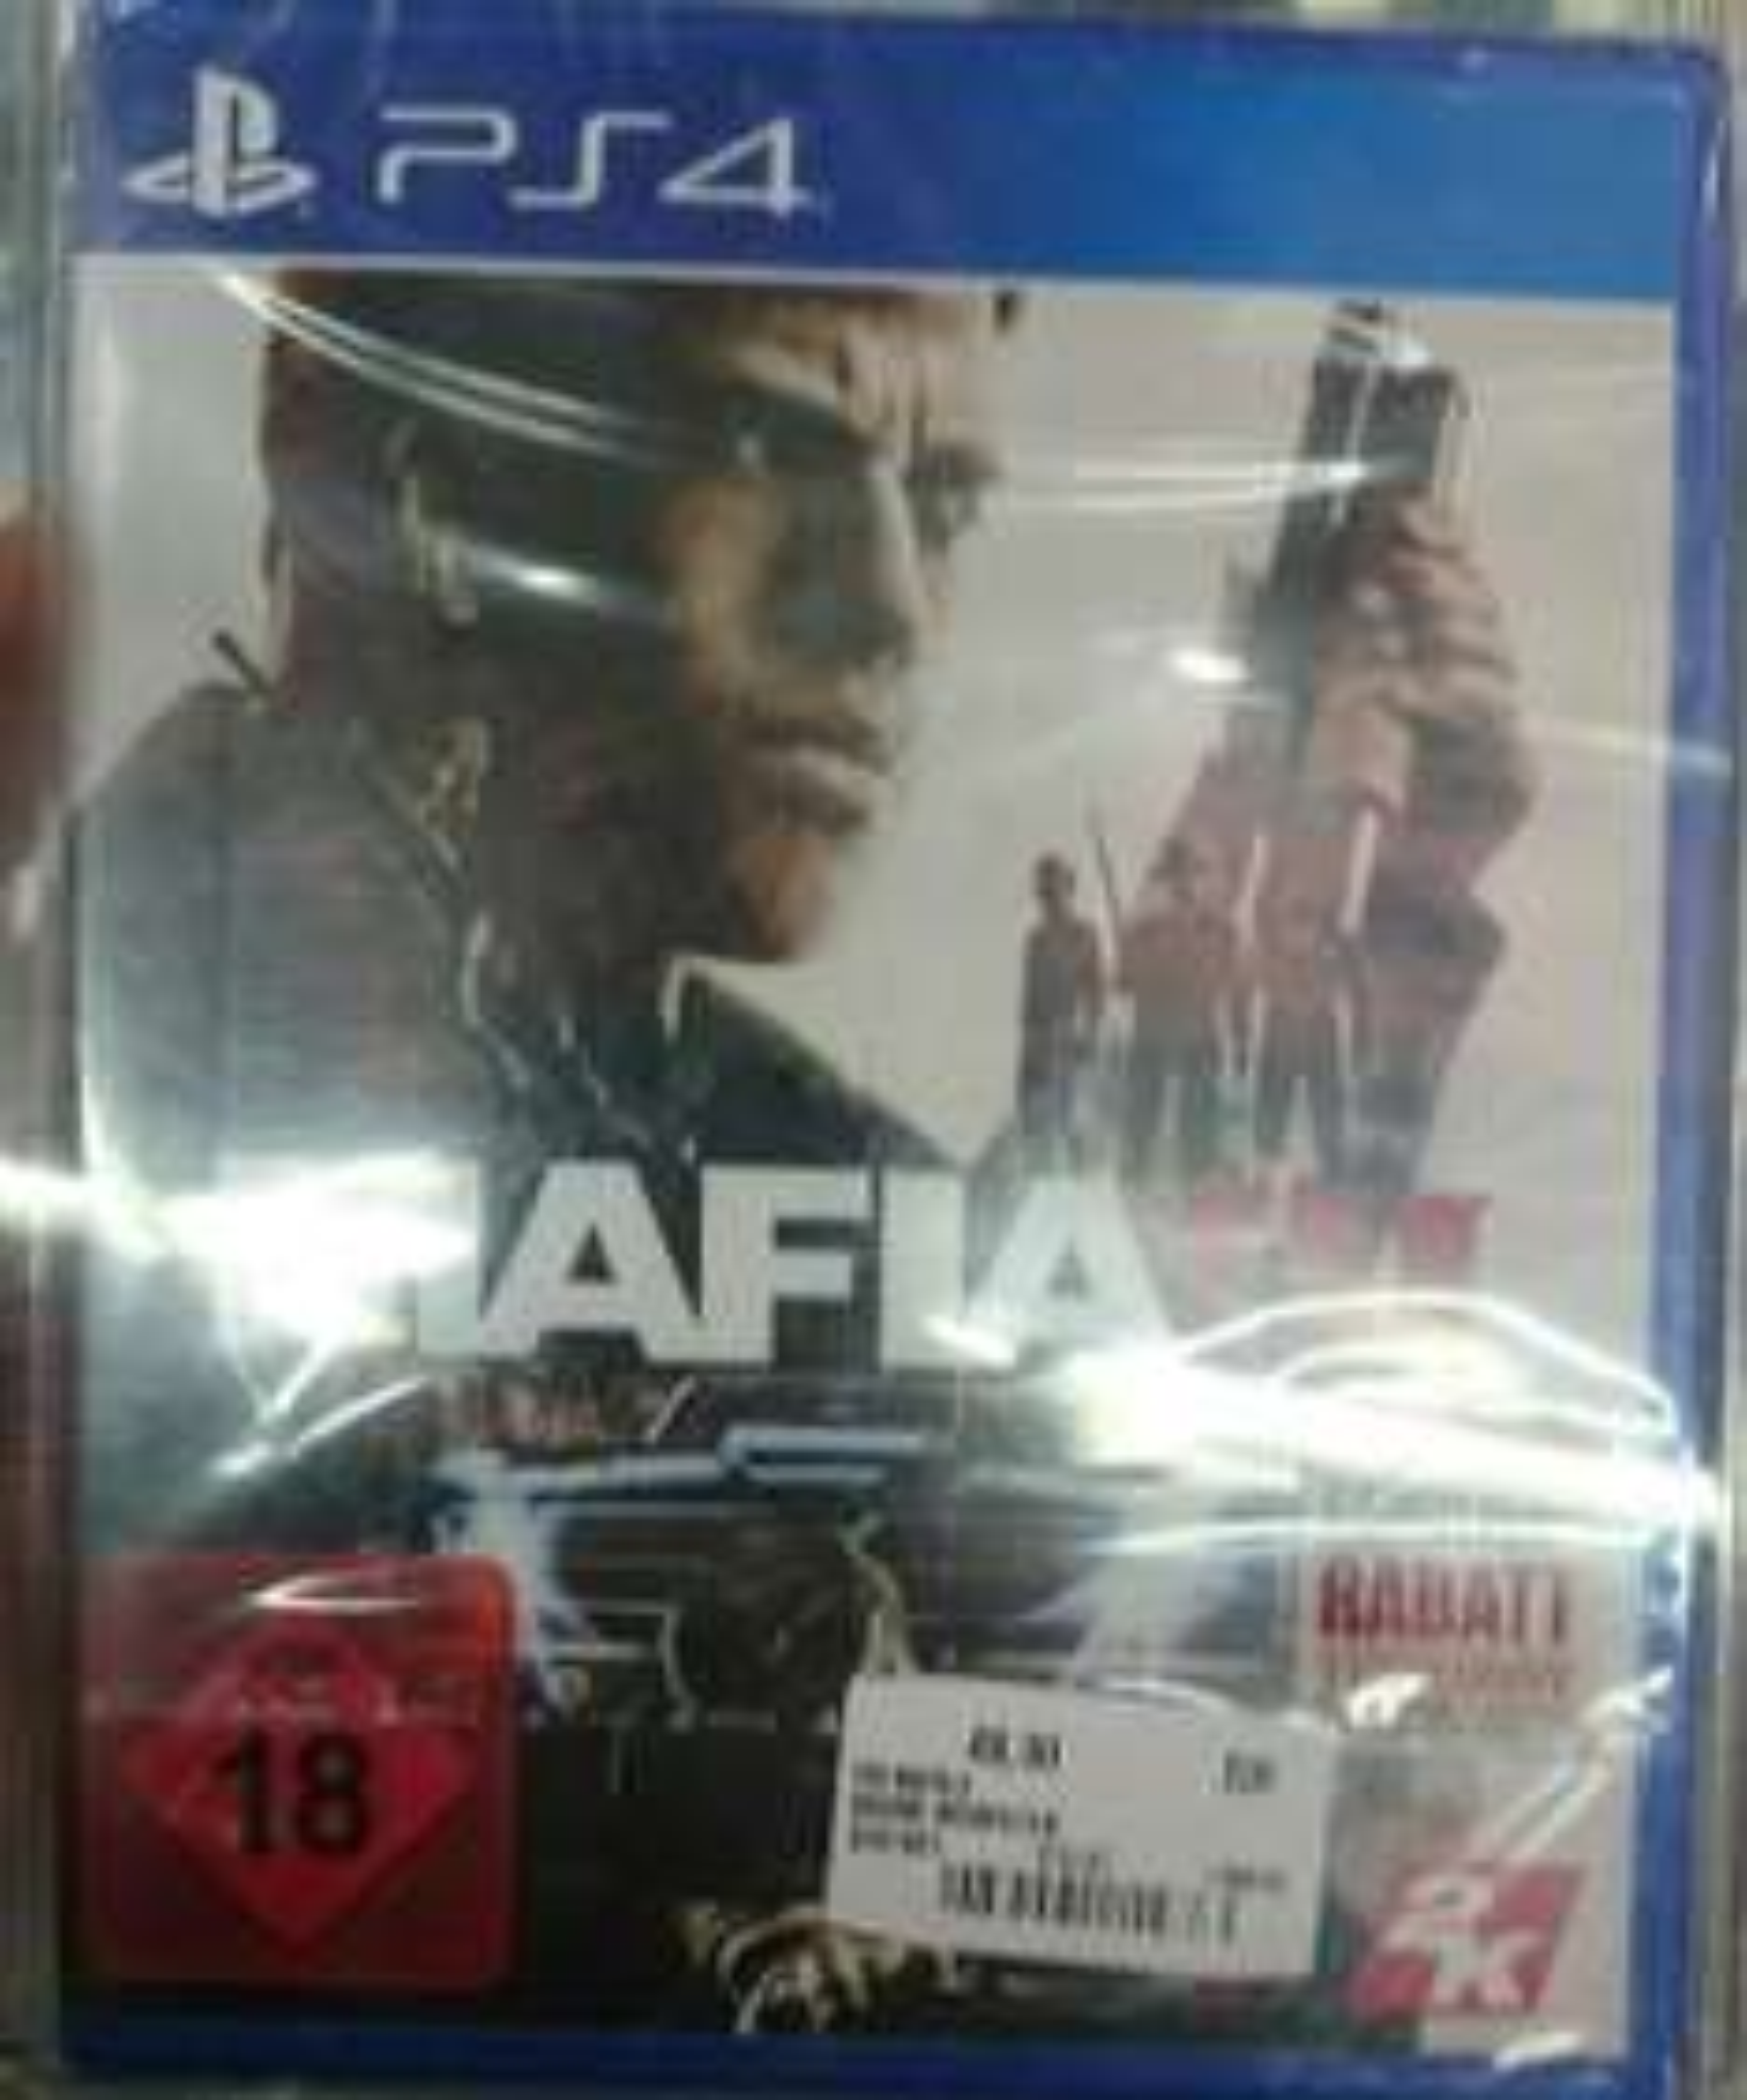 Lokal - Saturn Nürnberg | Mafia 3 PS4 für 49€